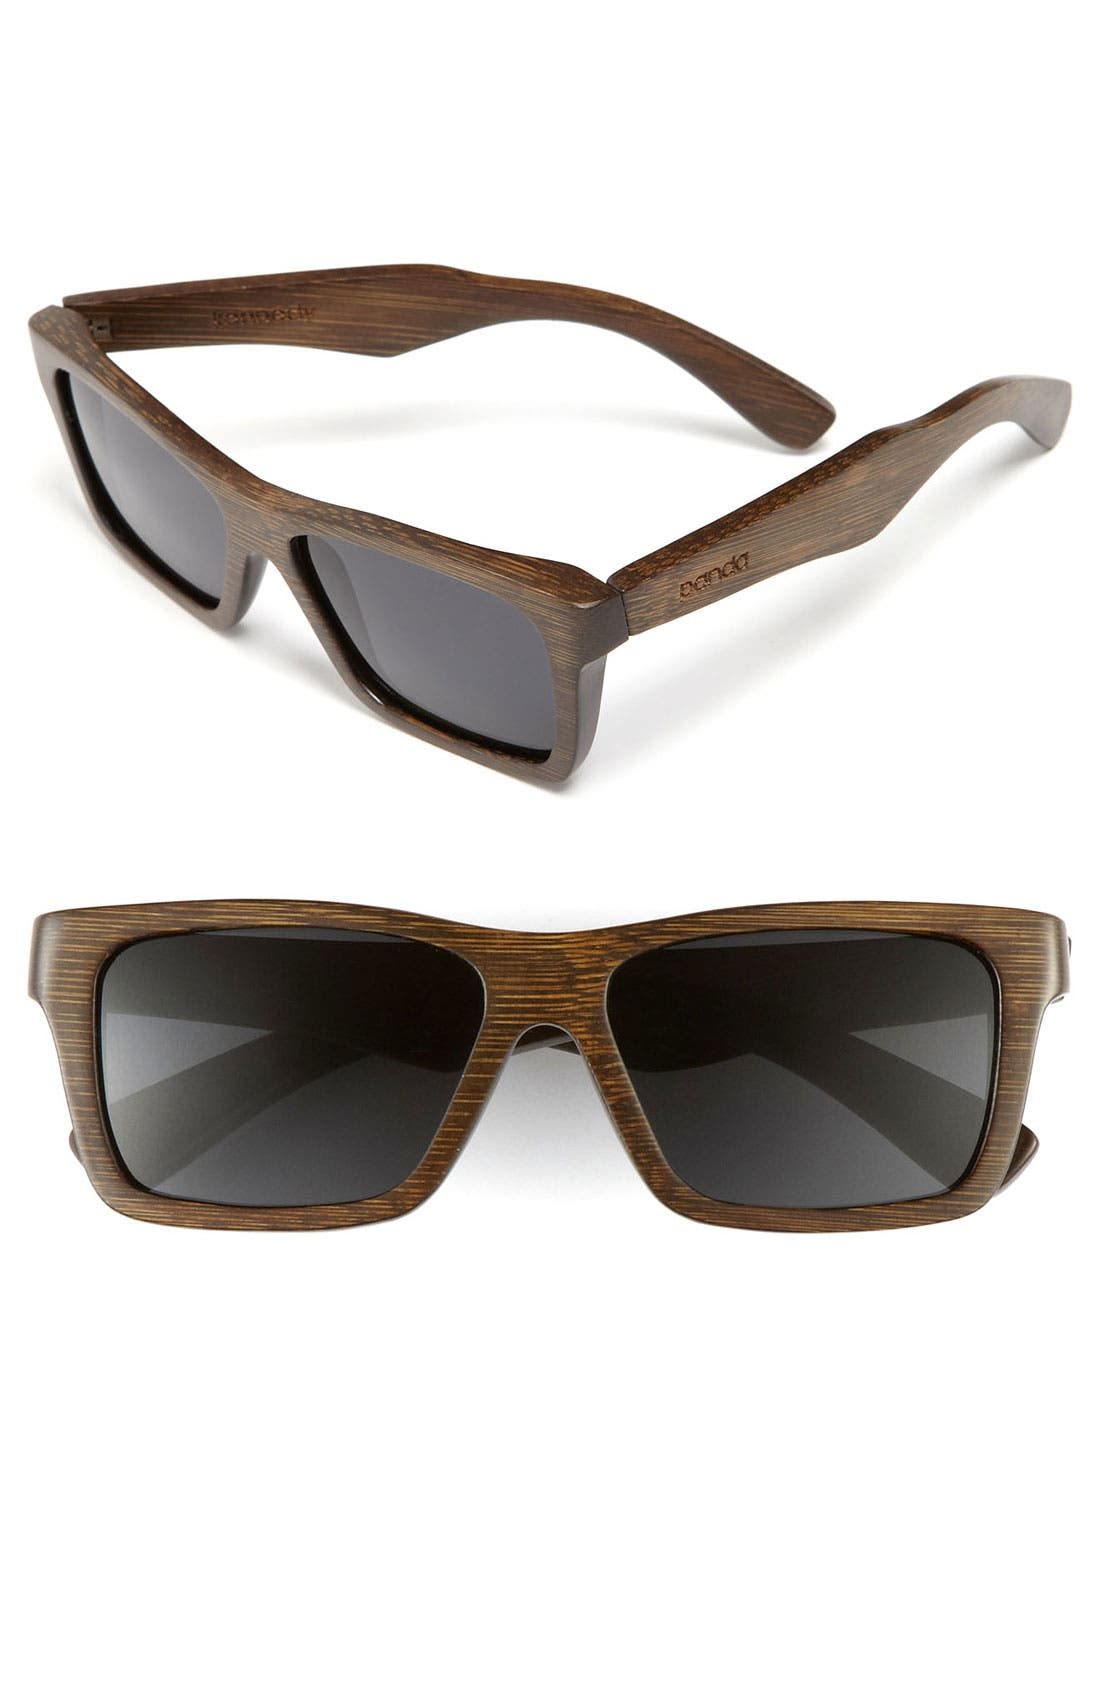 Alternate Image 1 Selected - Panda™ 'Kennedy' Sunglasses